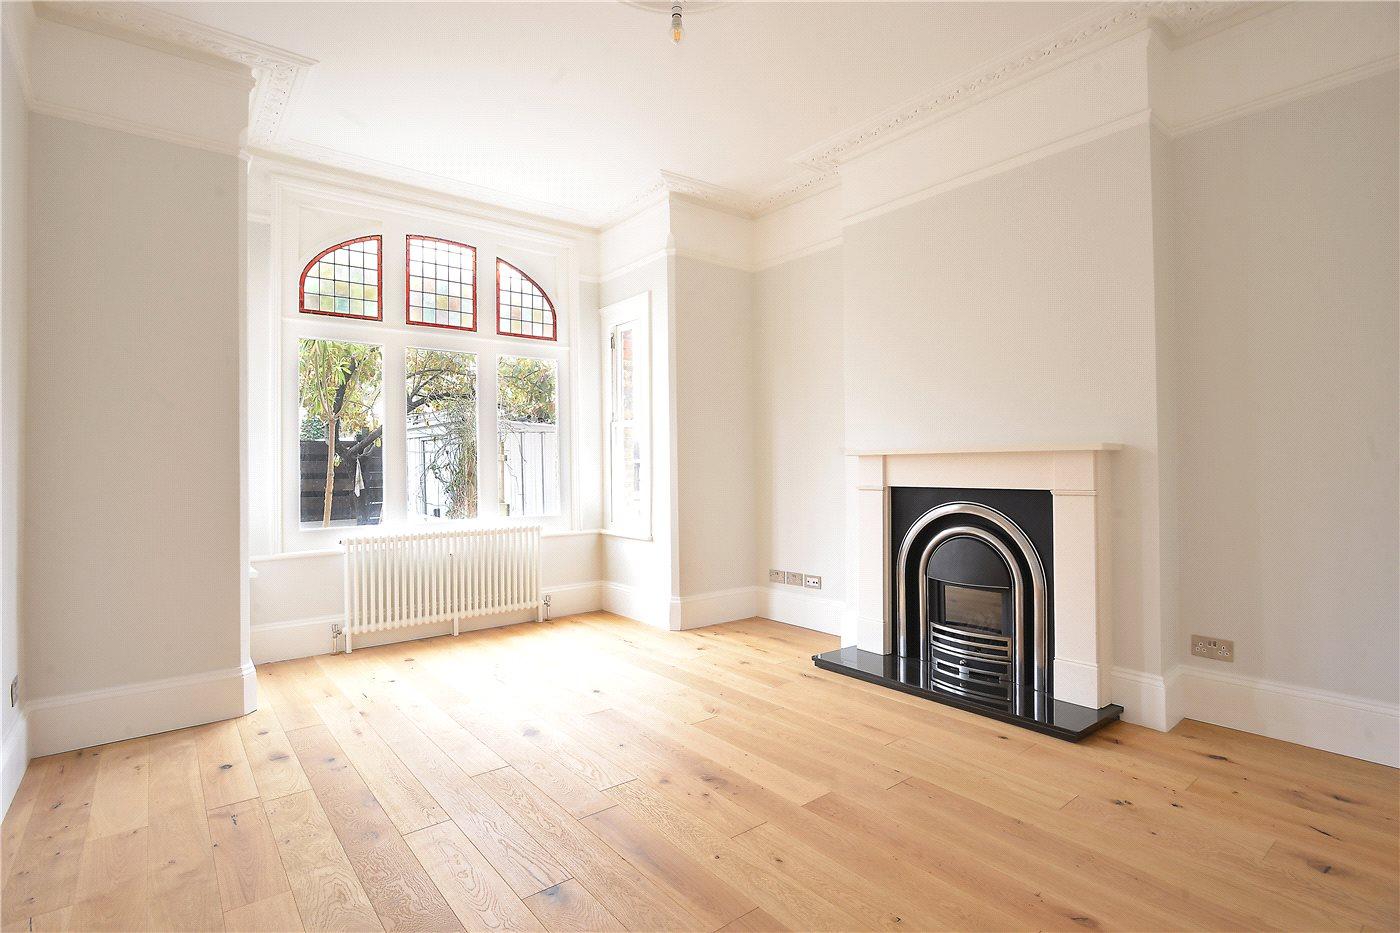 Three Double Bedrooms | Ground Floor Victorian Maisonette | Open Plan  Kitchen/Reception | Modern Bathroom U0026 Utility U0026 Shower Room | West Facing  Private ...